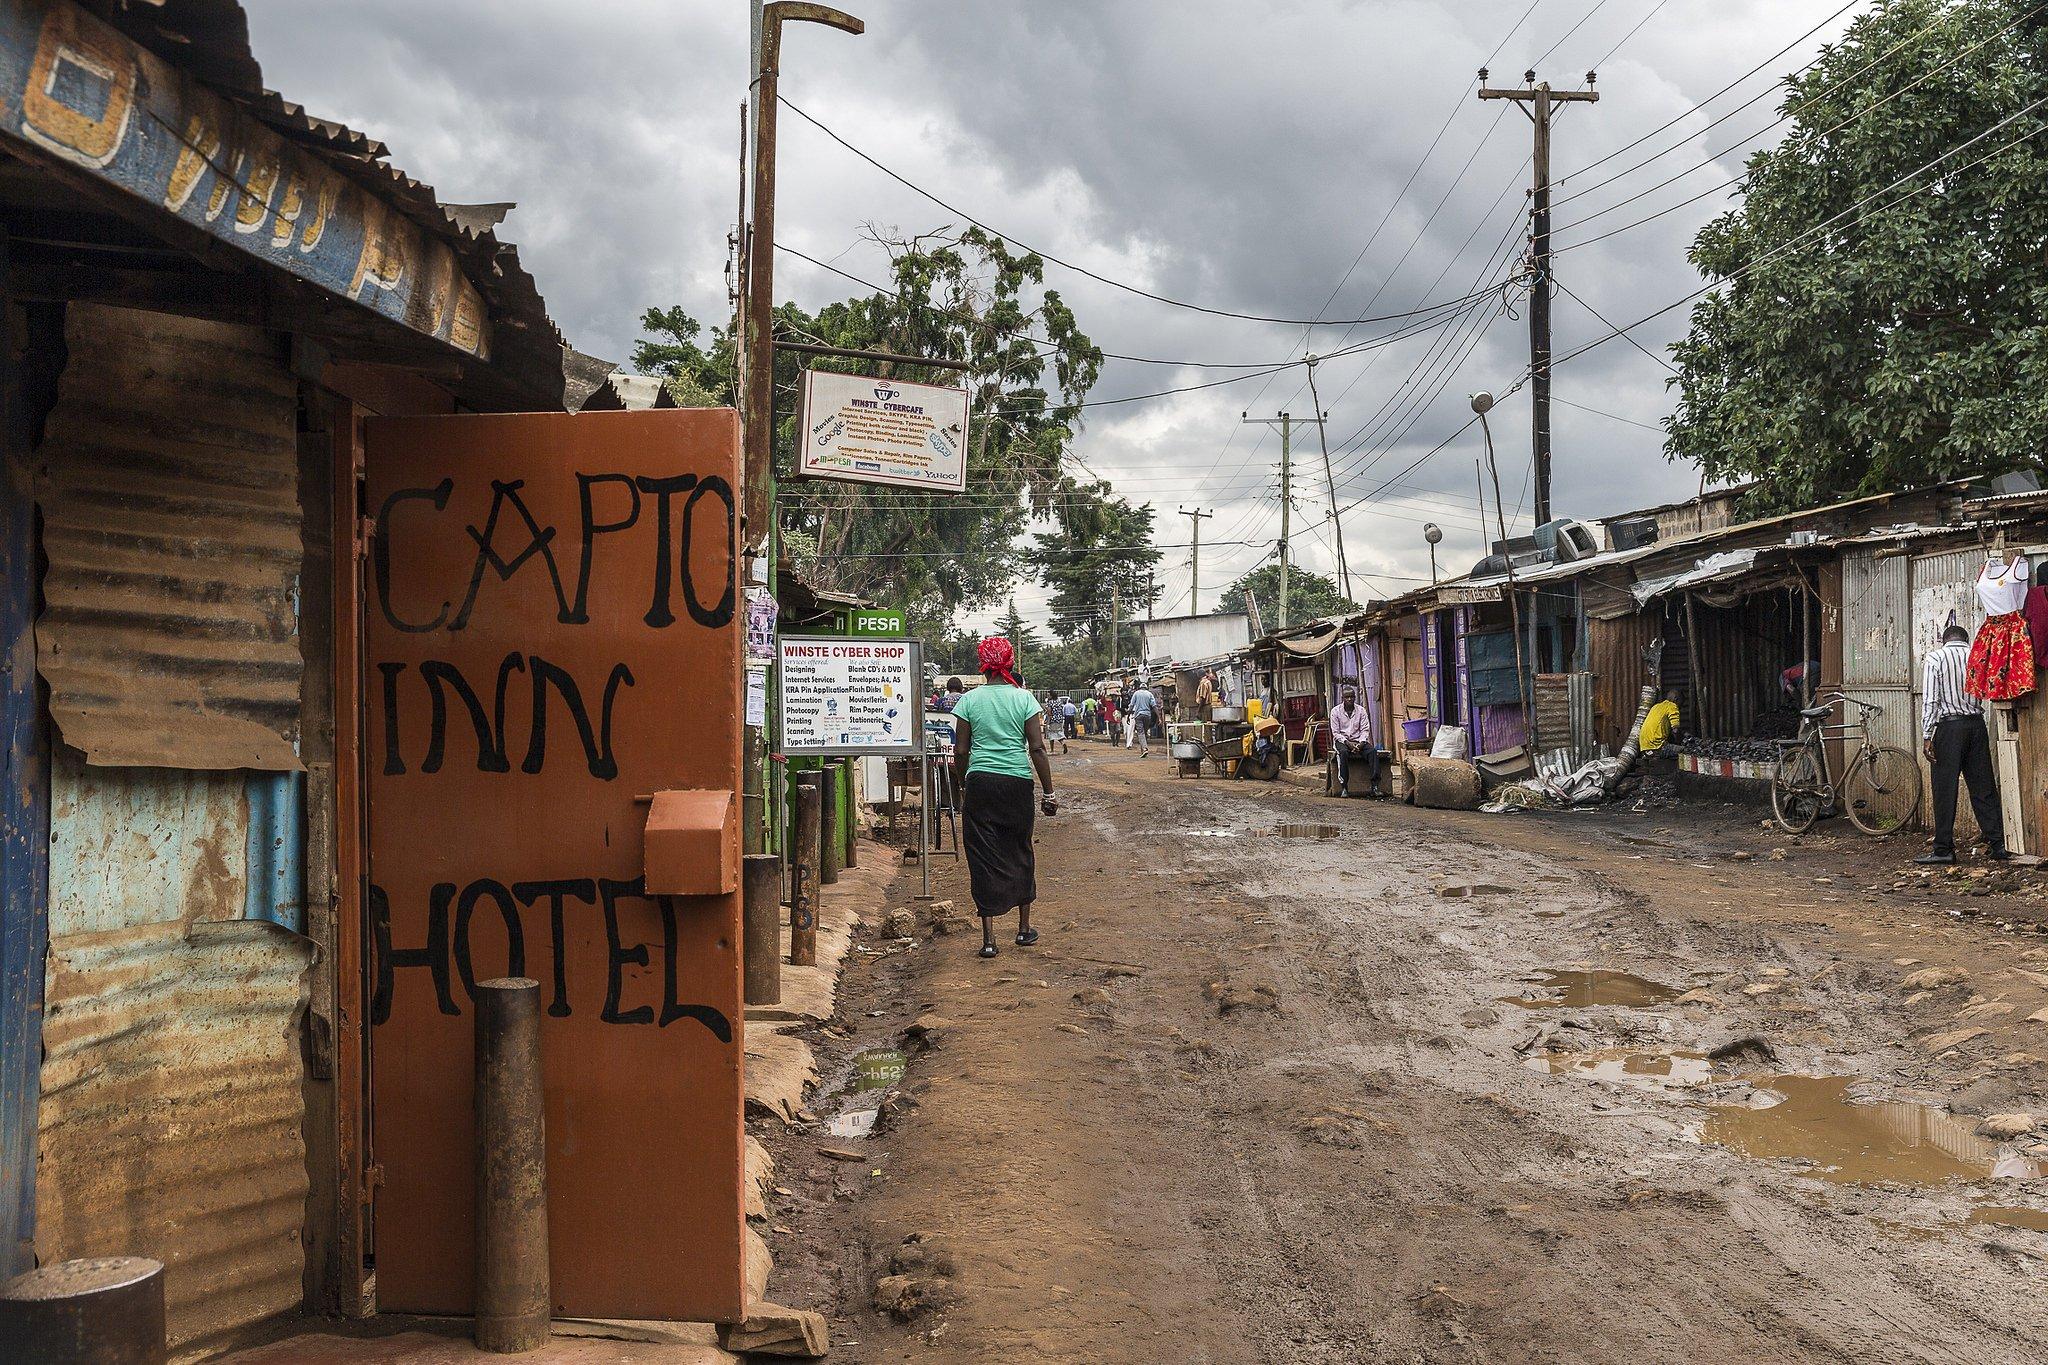 Fall Town Wallpaper Sub Saharan Africa Will Hold 90 Percent Of Children Living